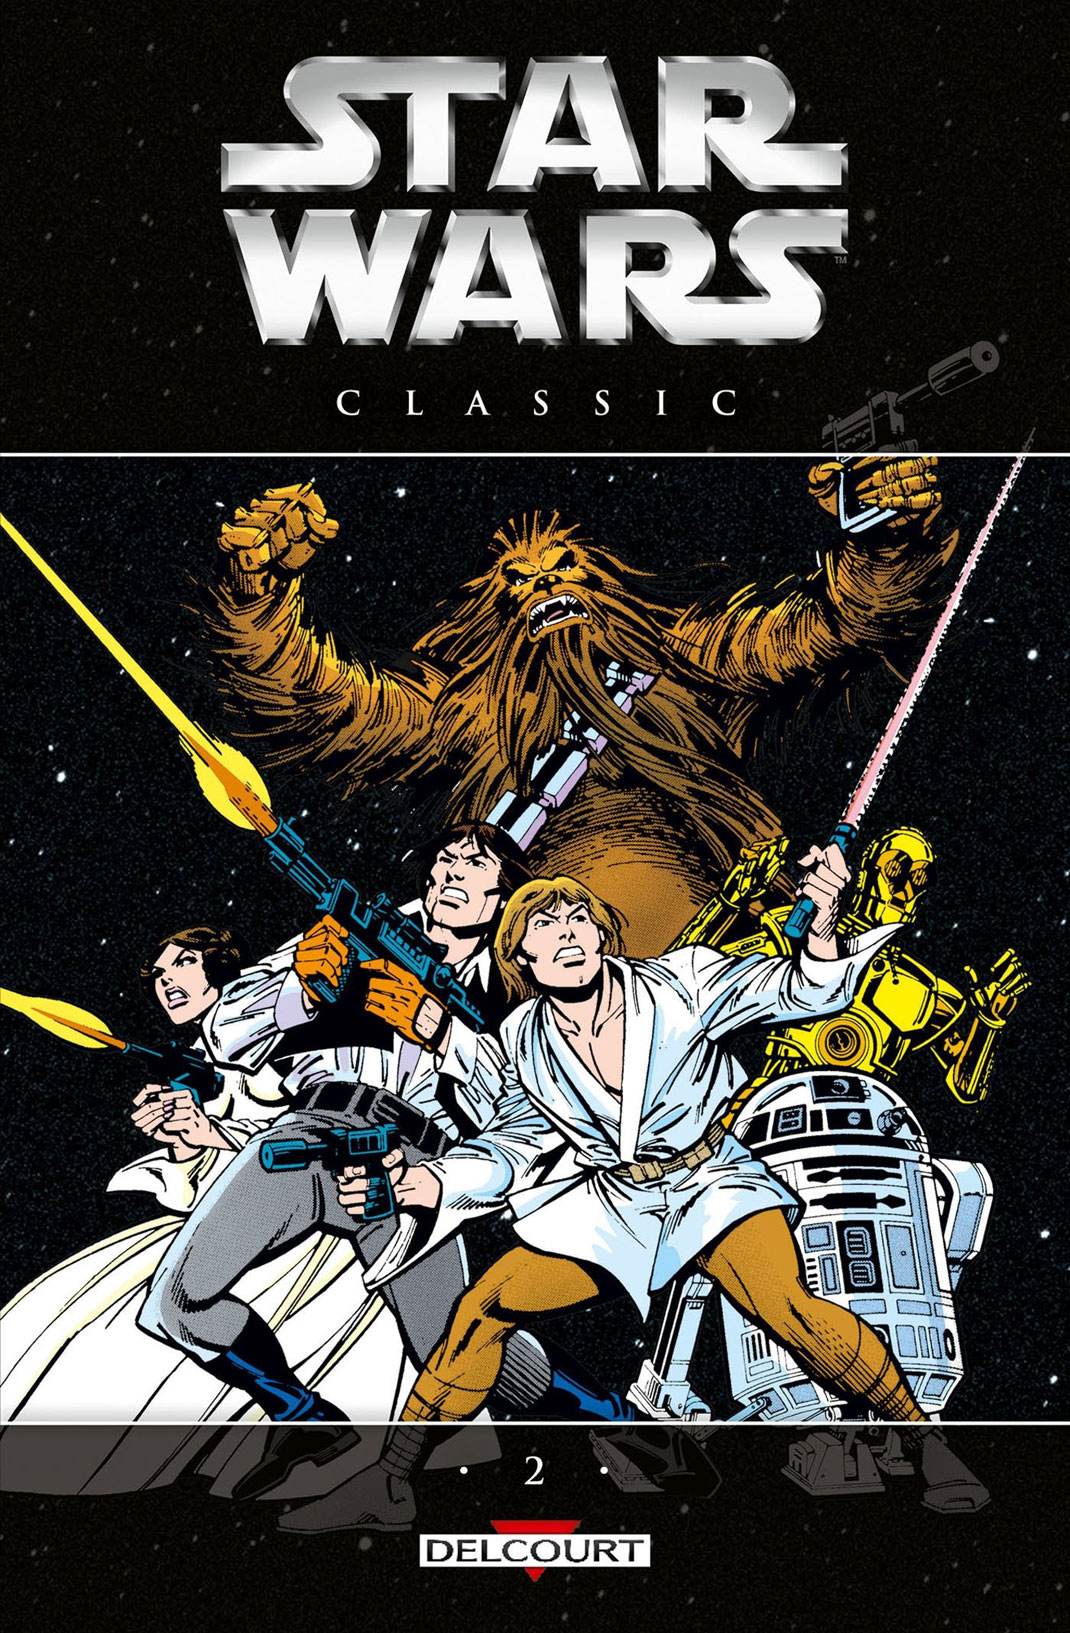 star-wars-classic-delcourt